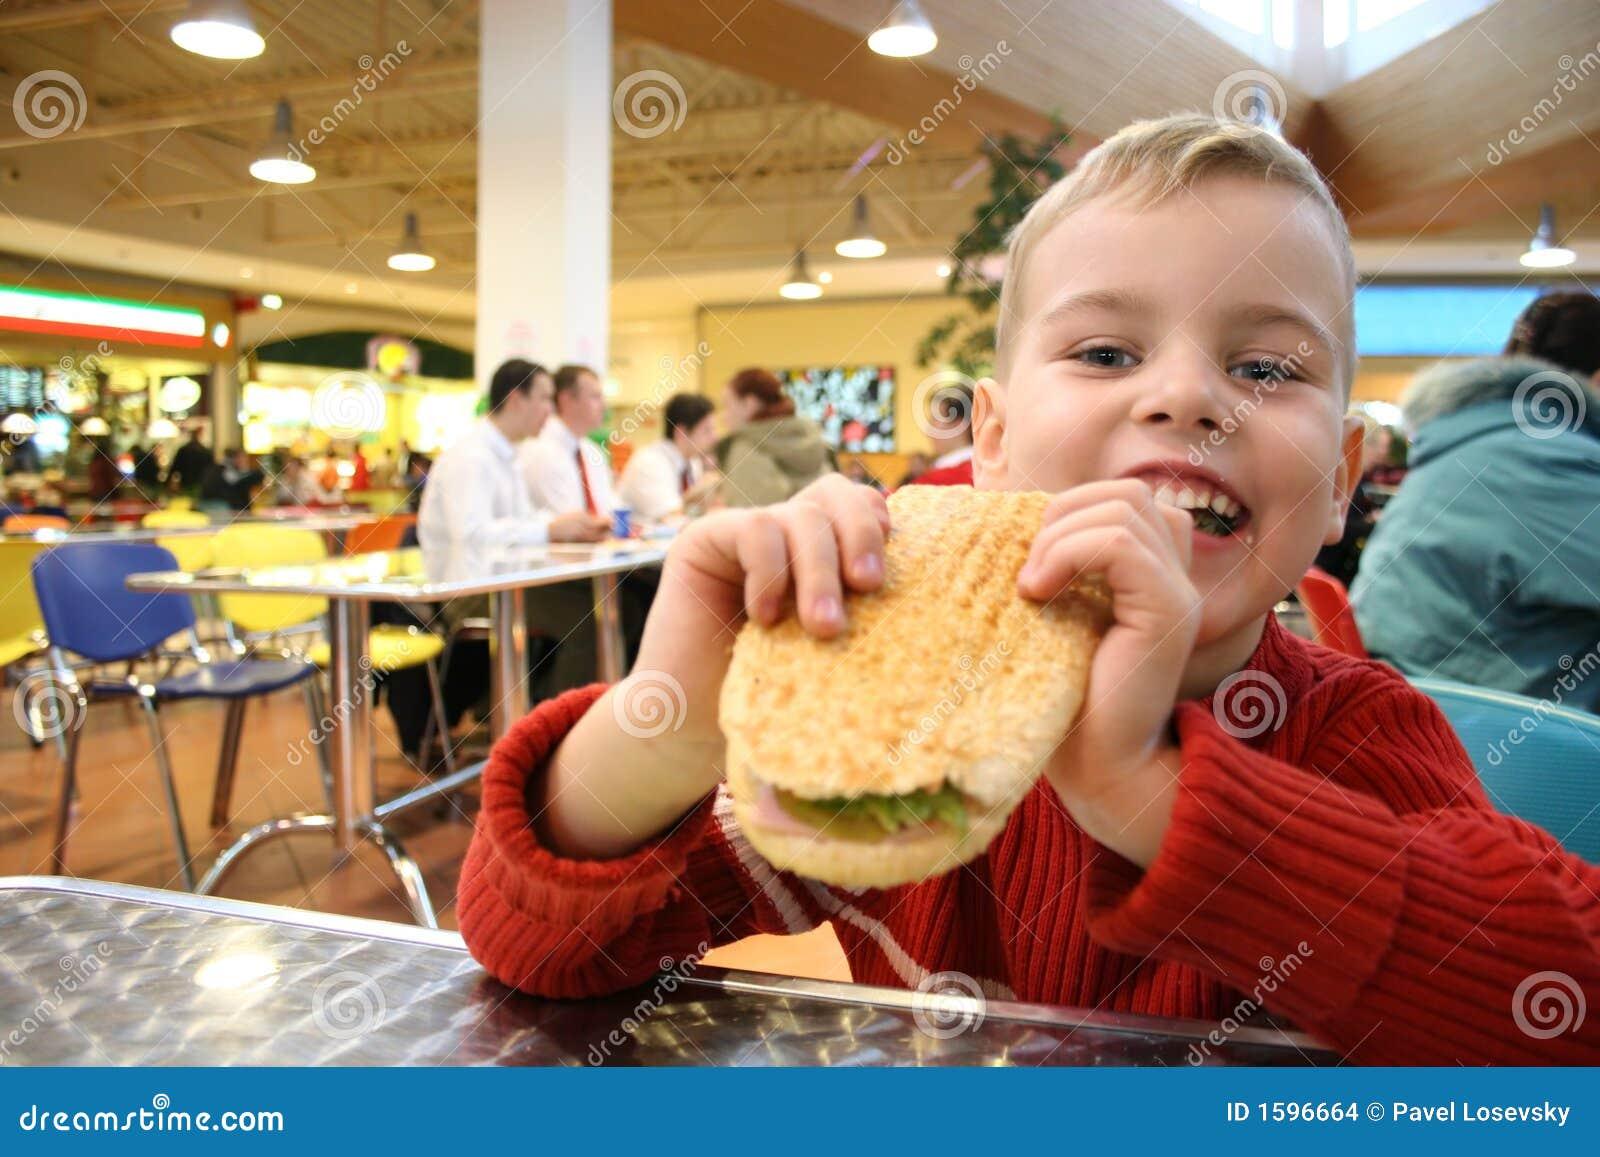 Kind essen Burger